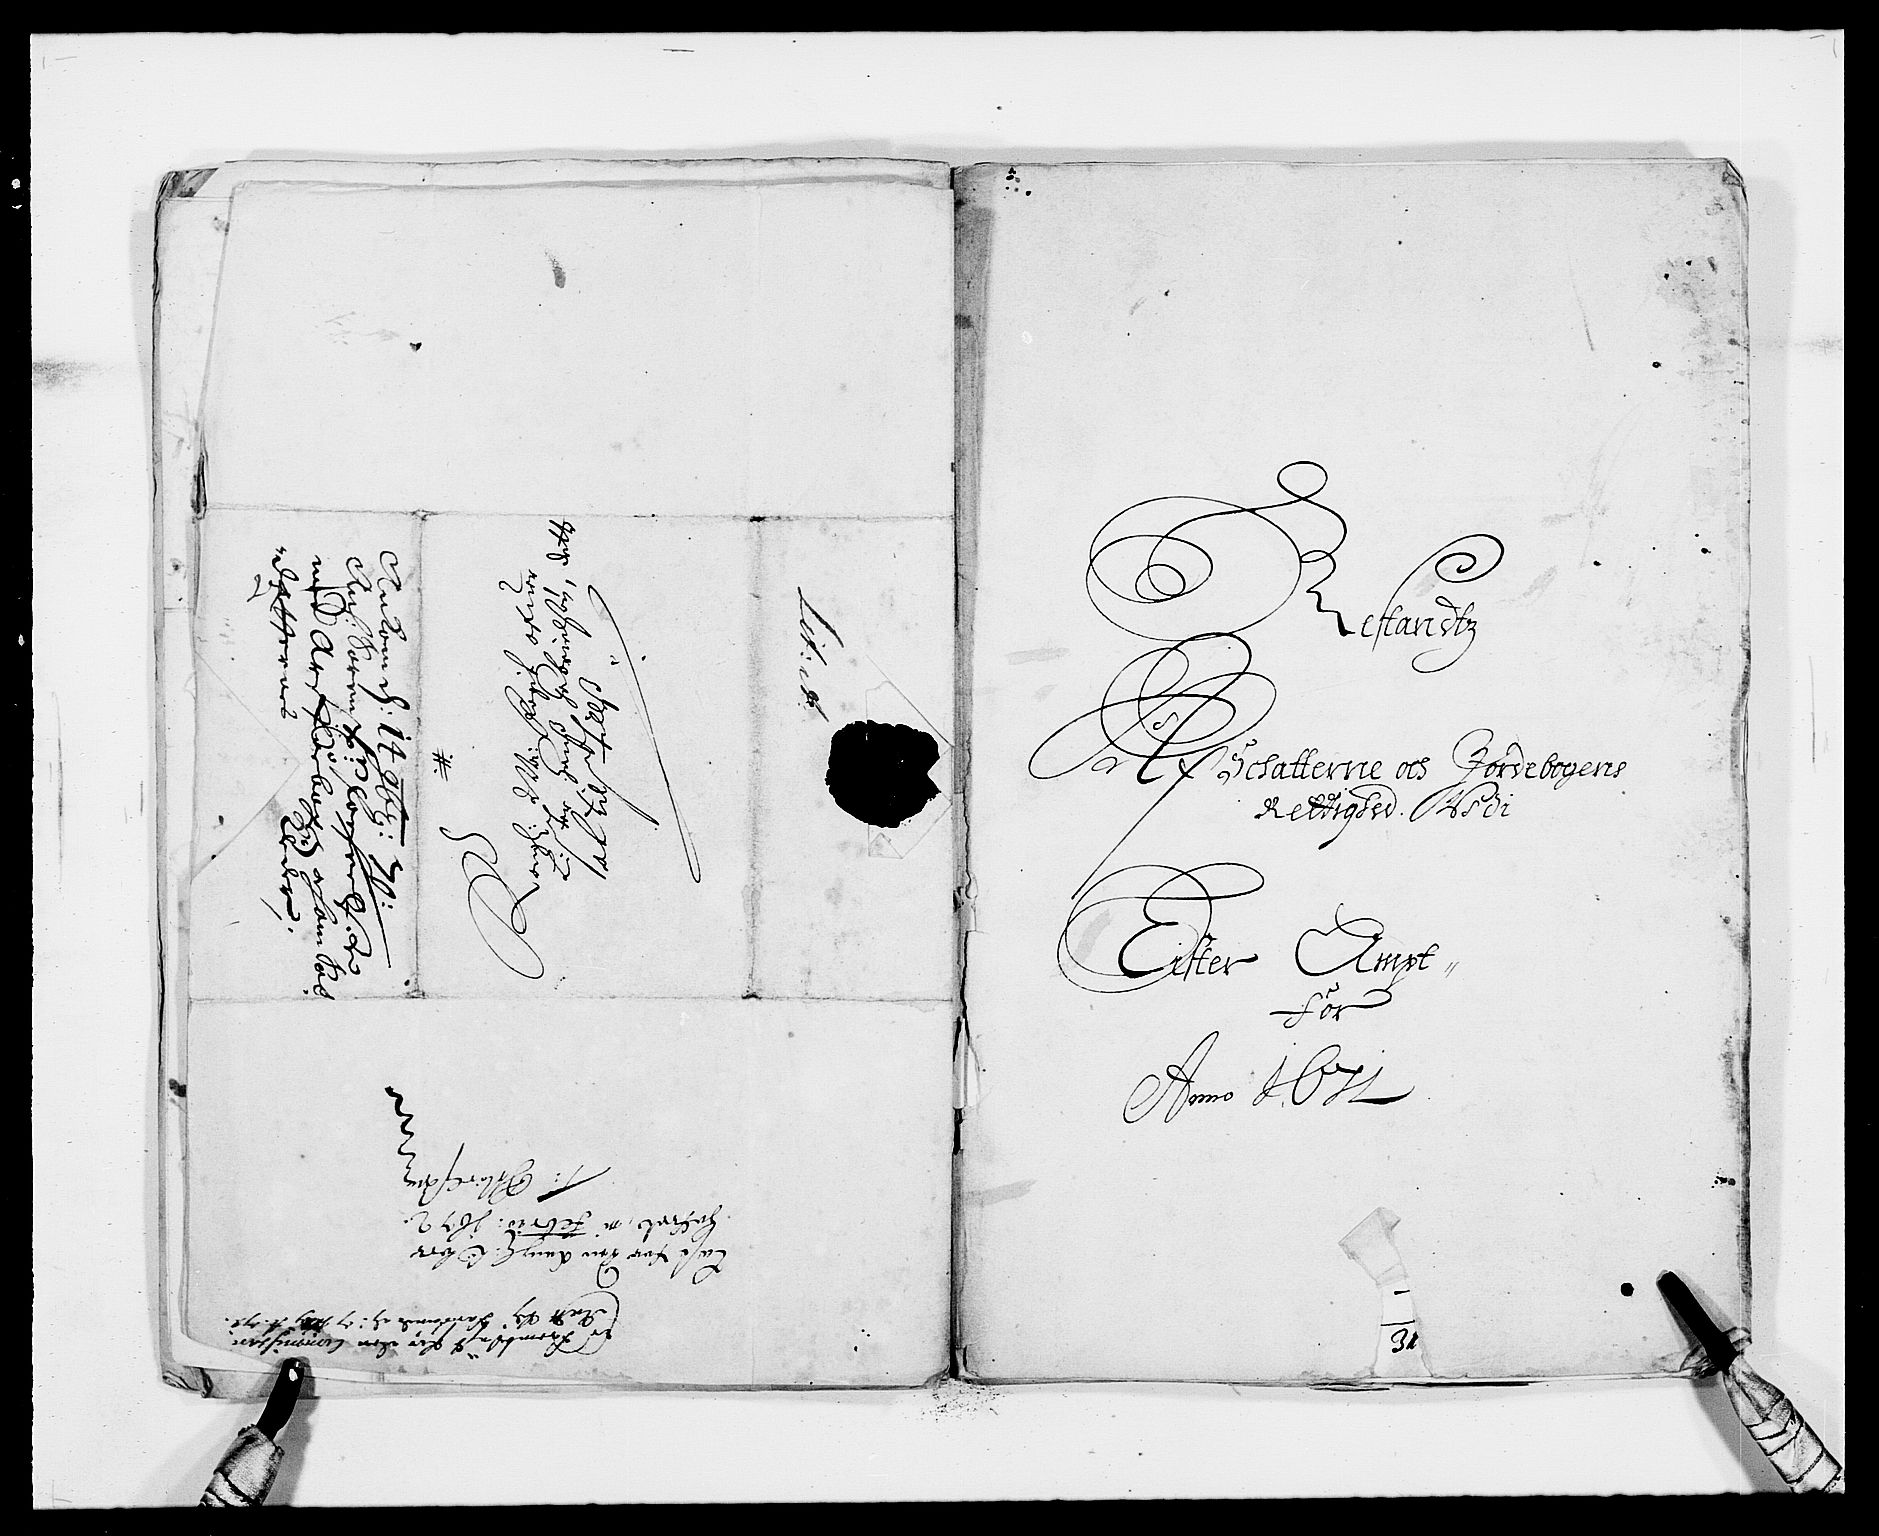 RA, Rentekammeret inntil 1814, Reviderte regnskaper, Fogderegnskap, R41/L2527: Fogderegnskap Lista, 1672, s. 205